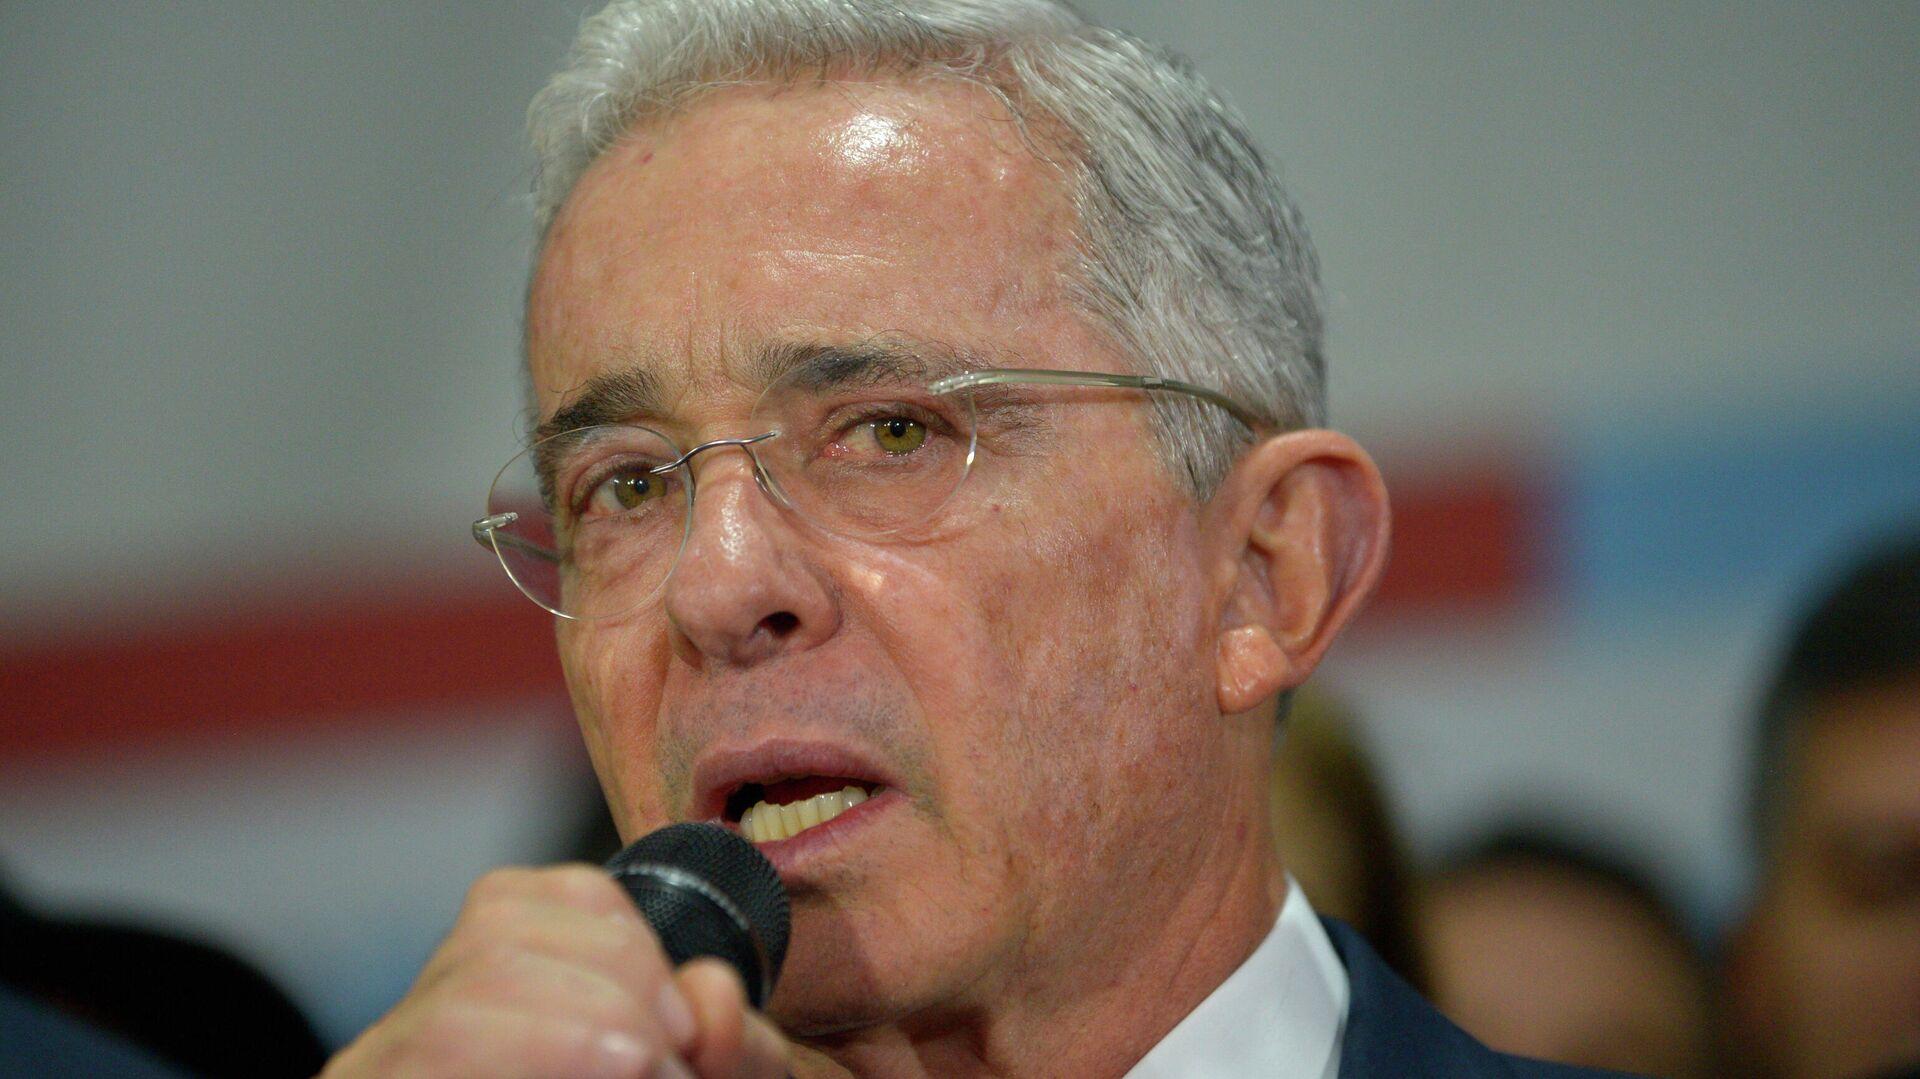 Álvaro Uribe, expresidente de Colombia - Sputnik Mundo, 1920, 16.03.2021